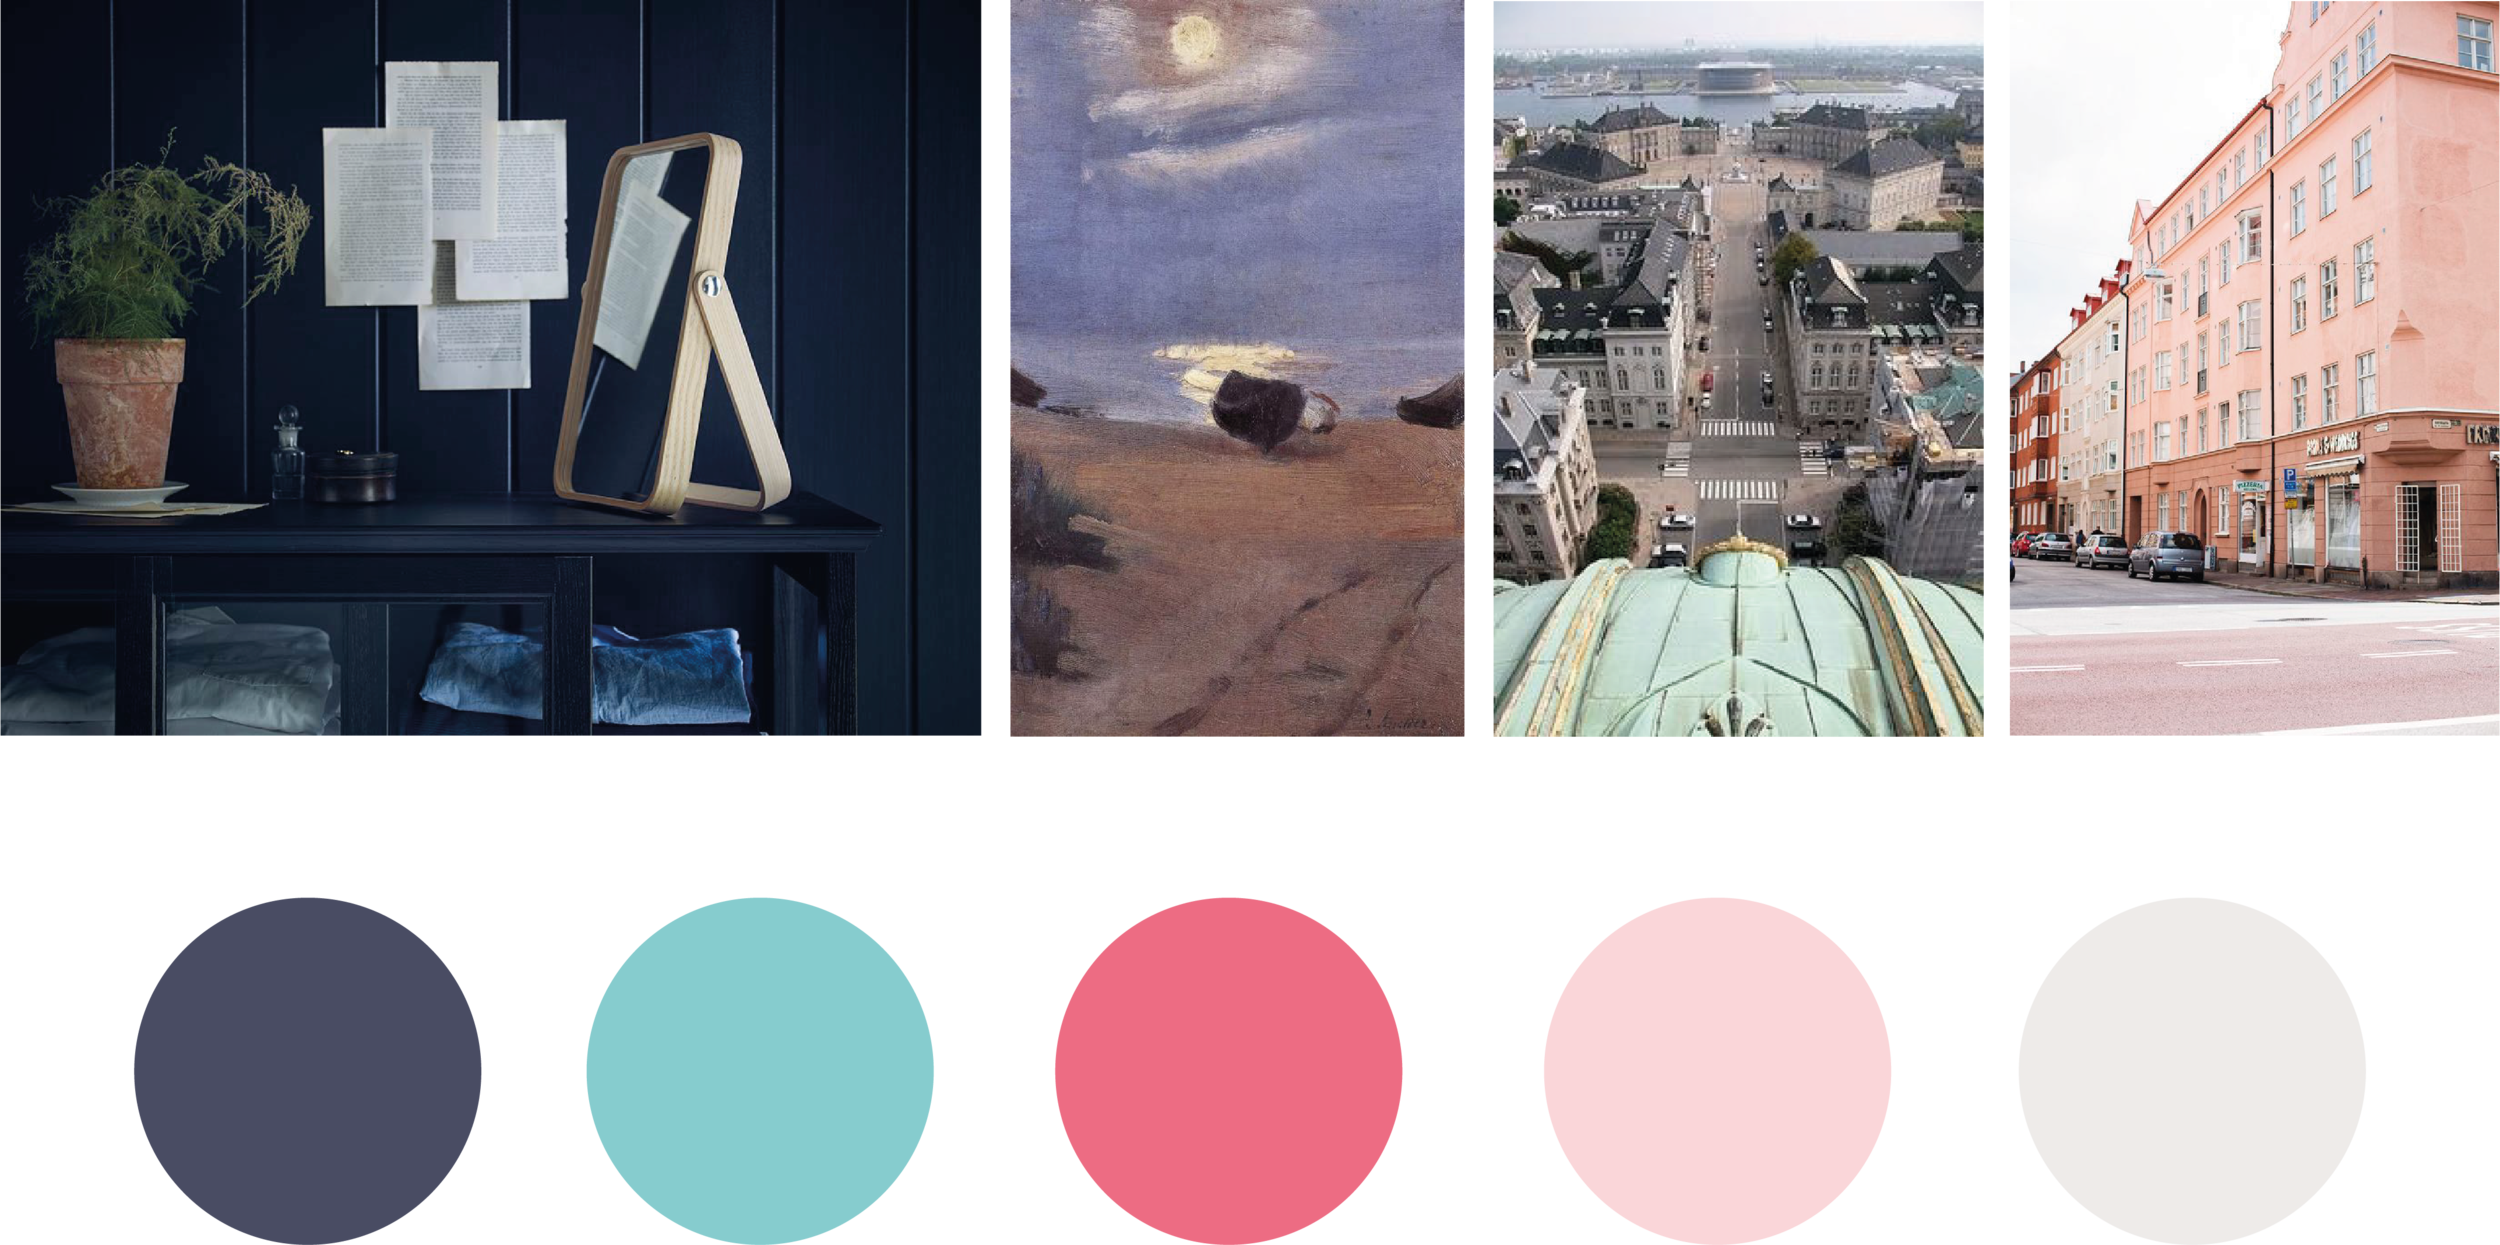 colourpalette-01.png